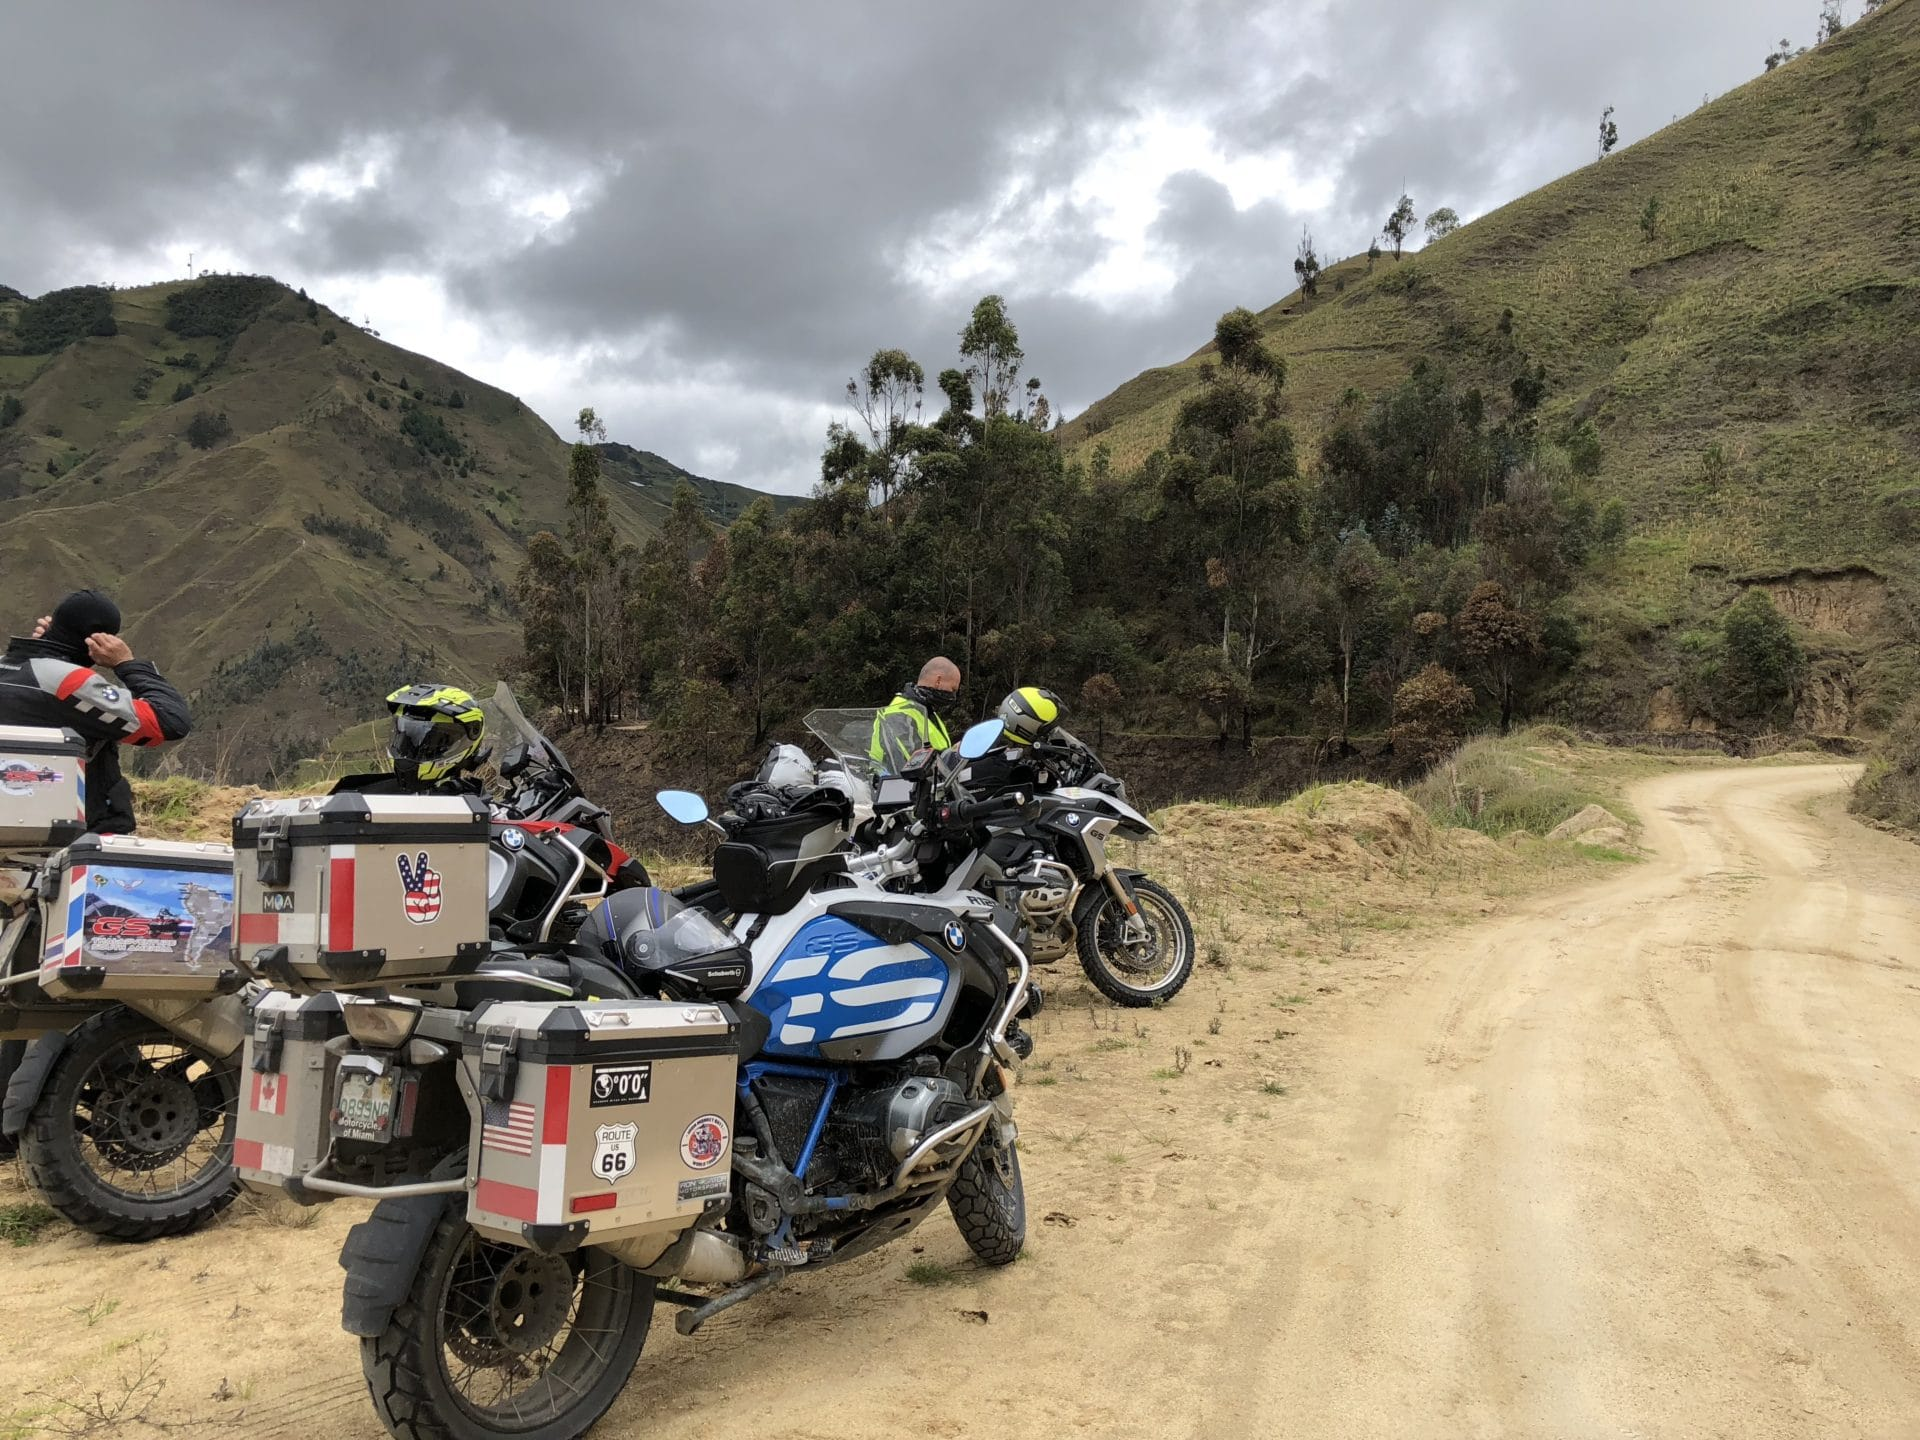 Dirt riding in Loja